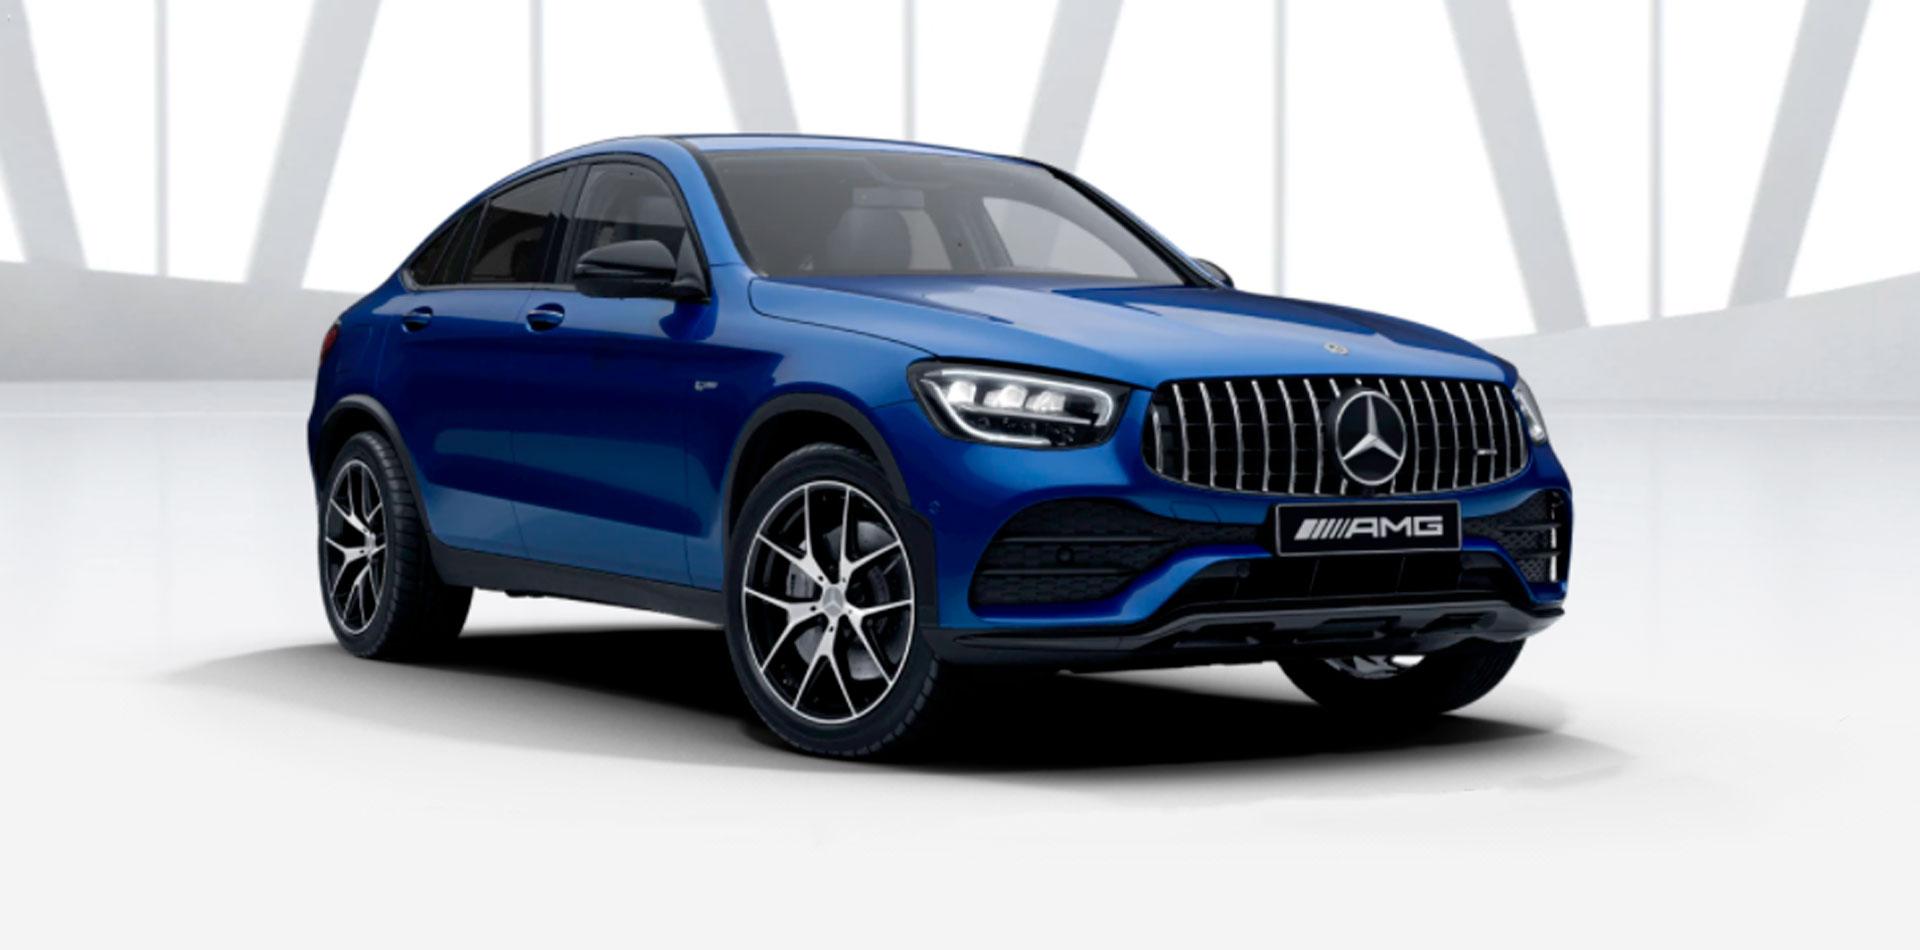 Mercedes-Benz GLC Coupe 0152620172